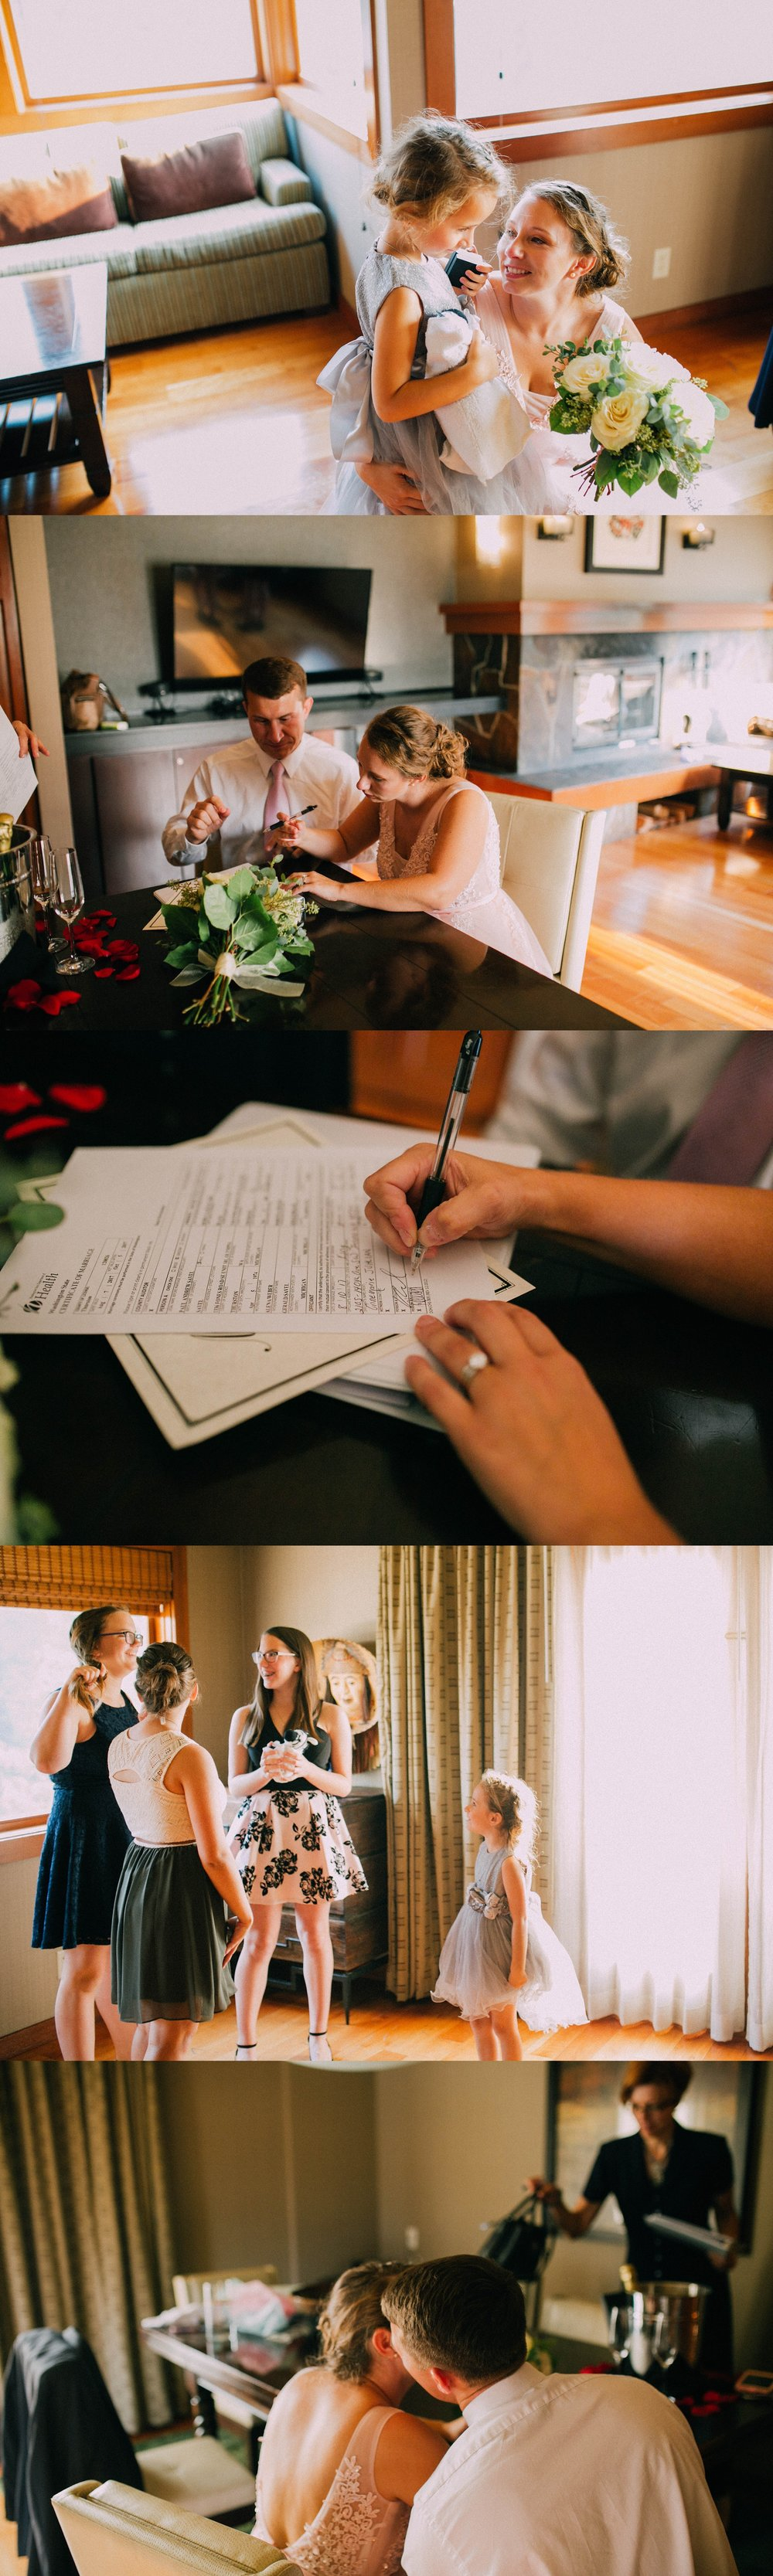 ashley_vos_seattle_ wedding_photographer_0485.jpg